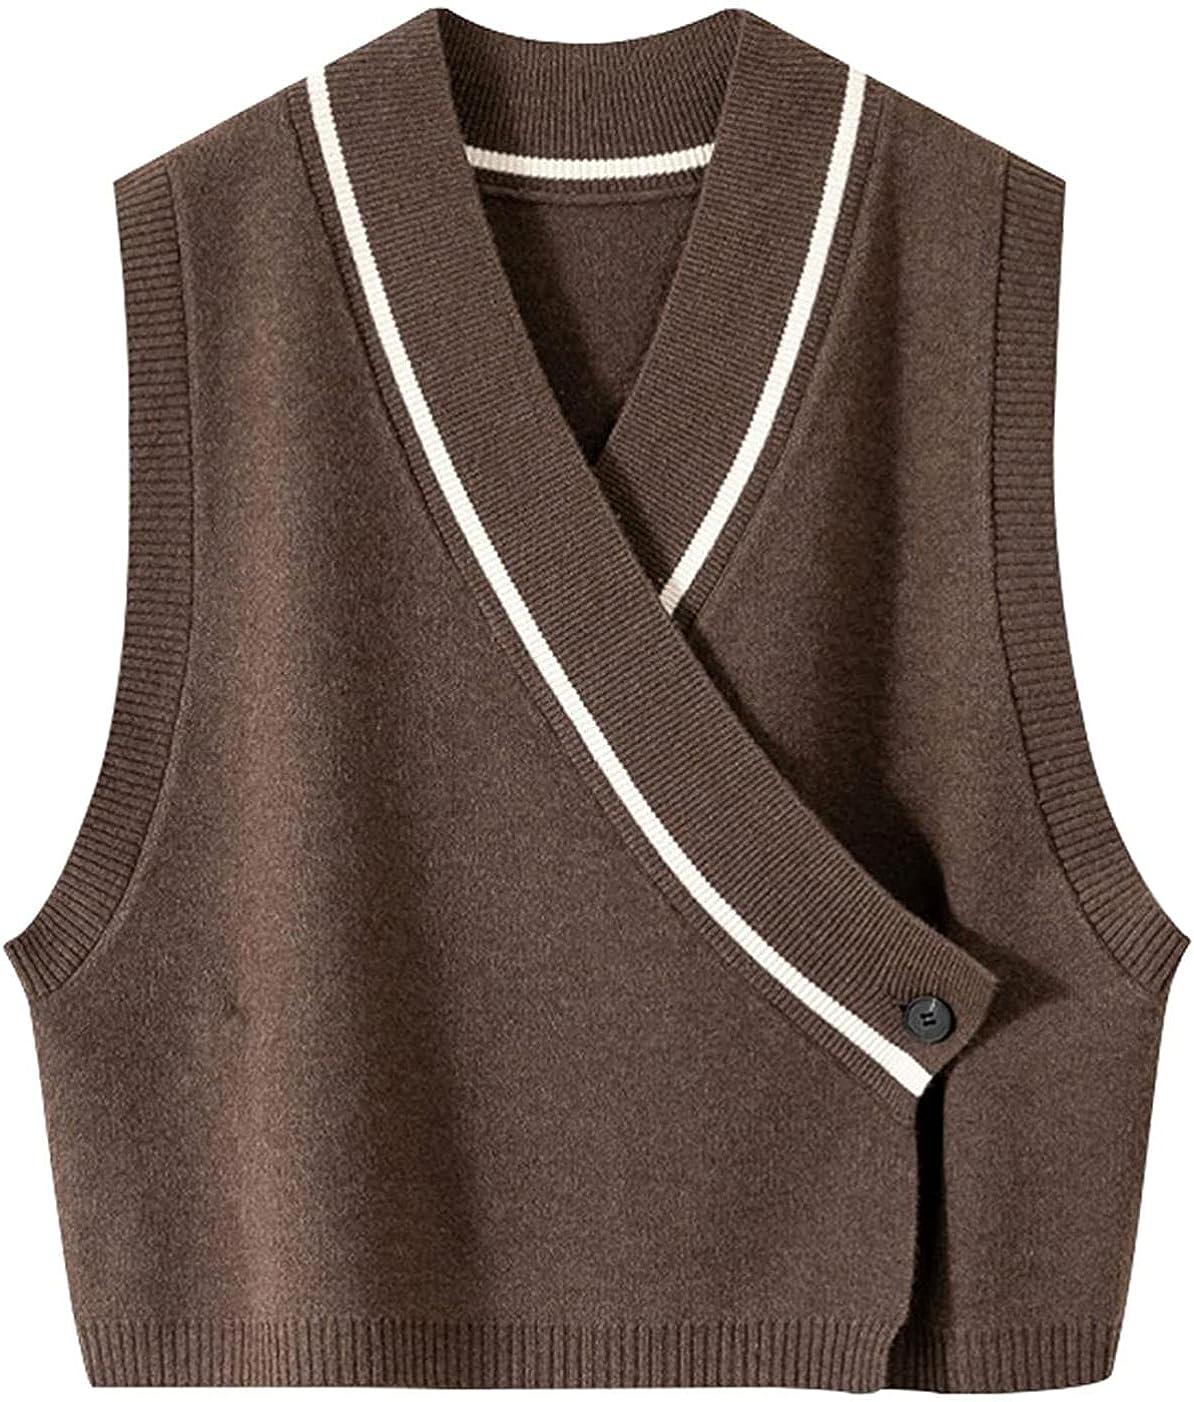 WSBD Women's V Neck Solid Color Sleeveless Knit Sweater Vest